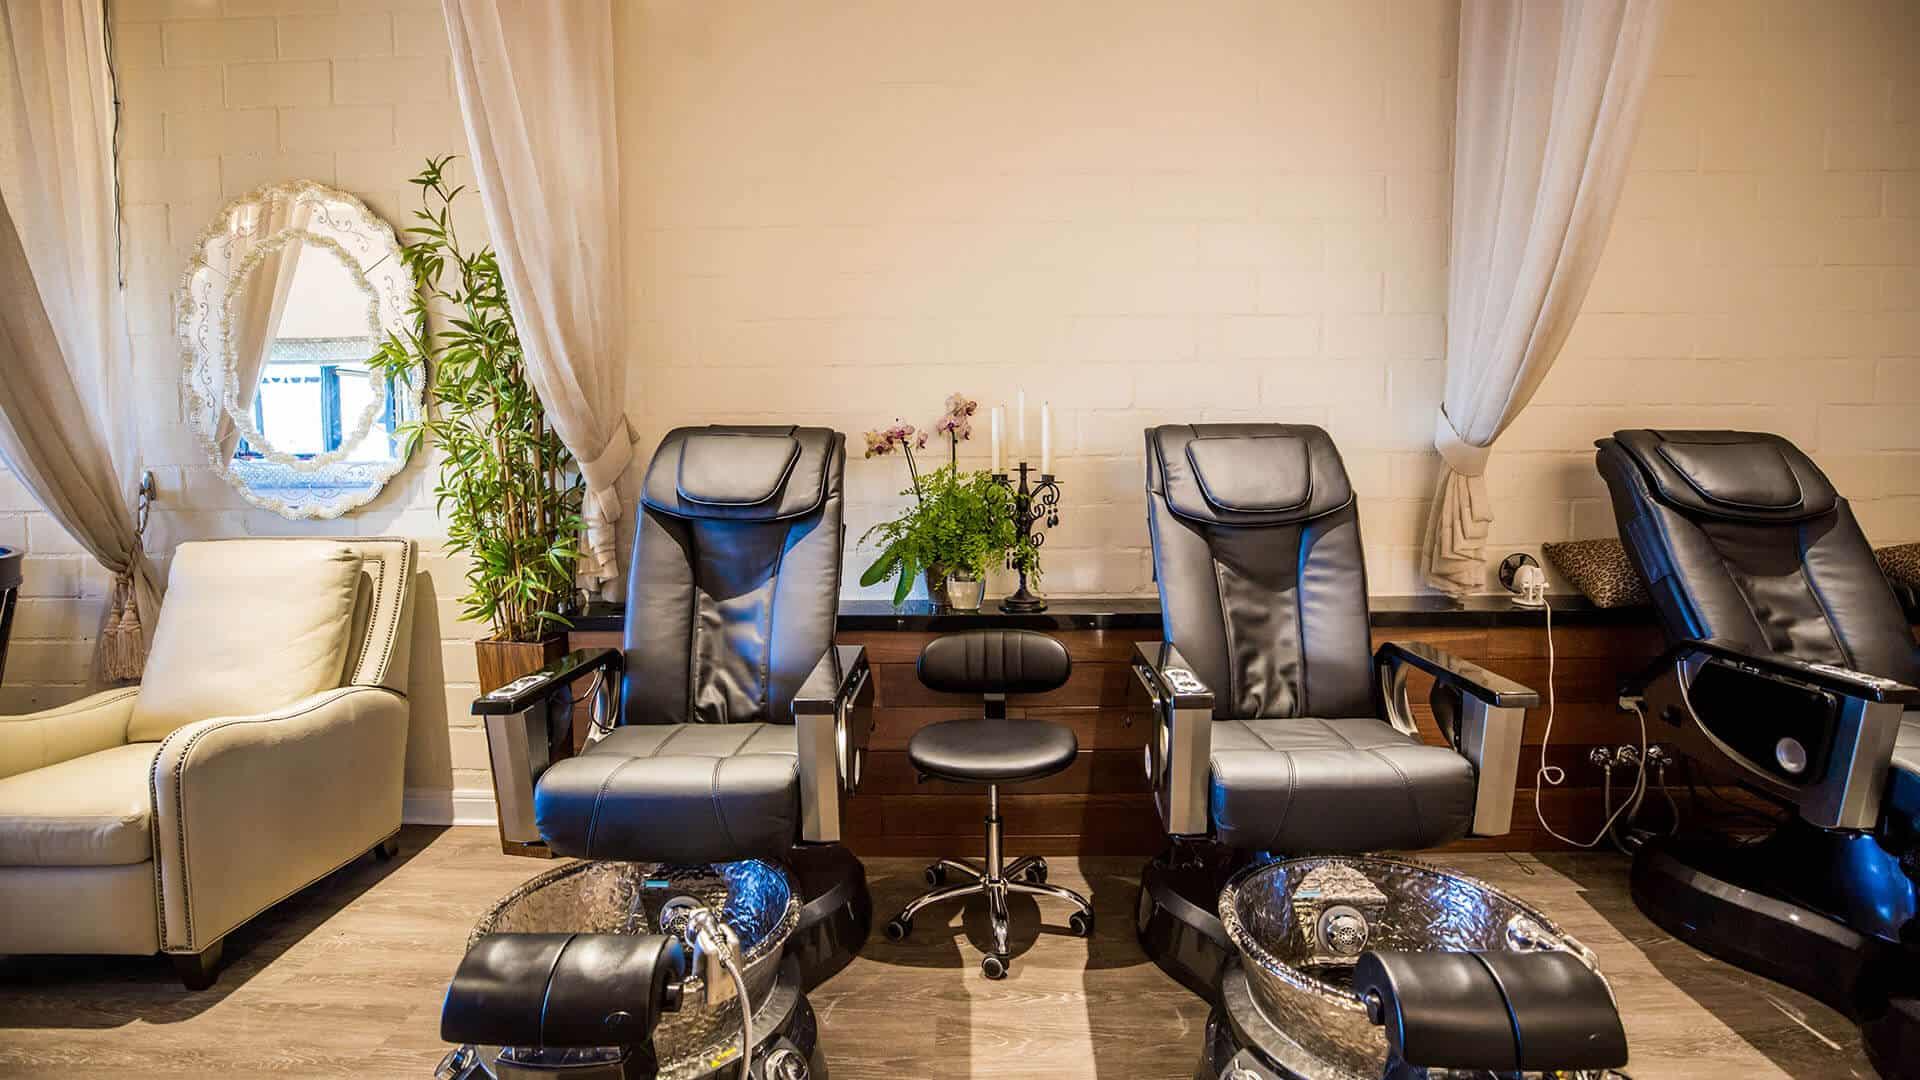 Photo of COCO nailboutique interior leather salon chairs